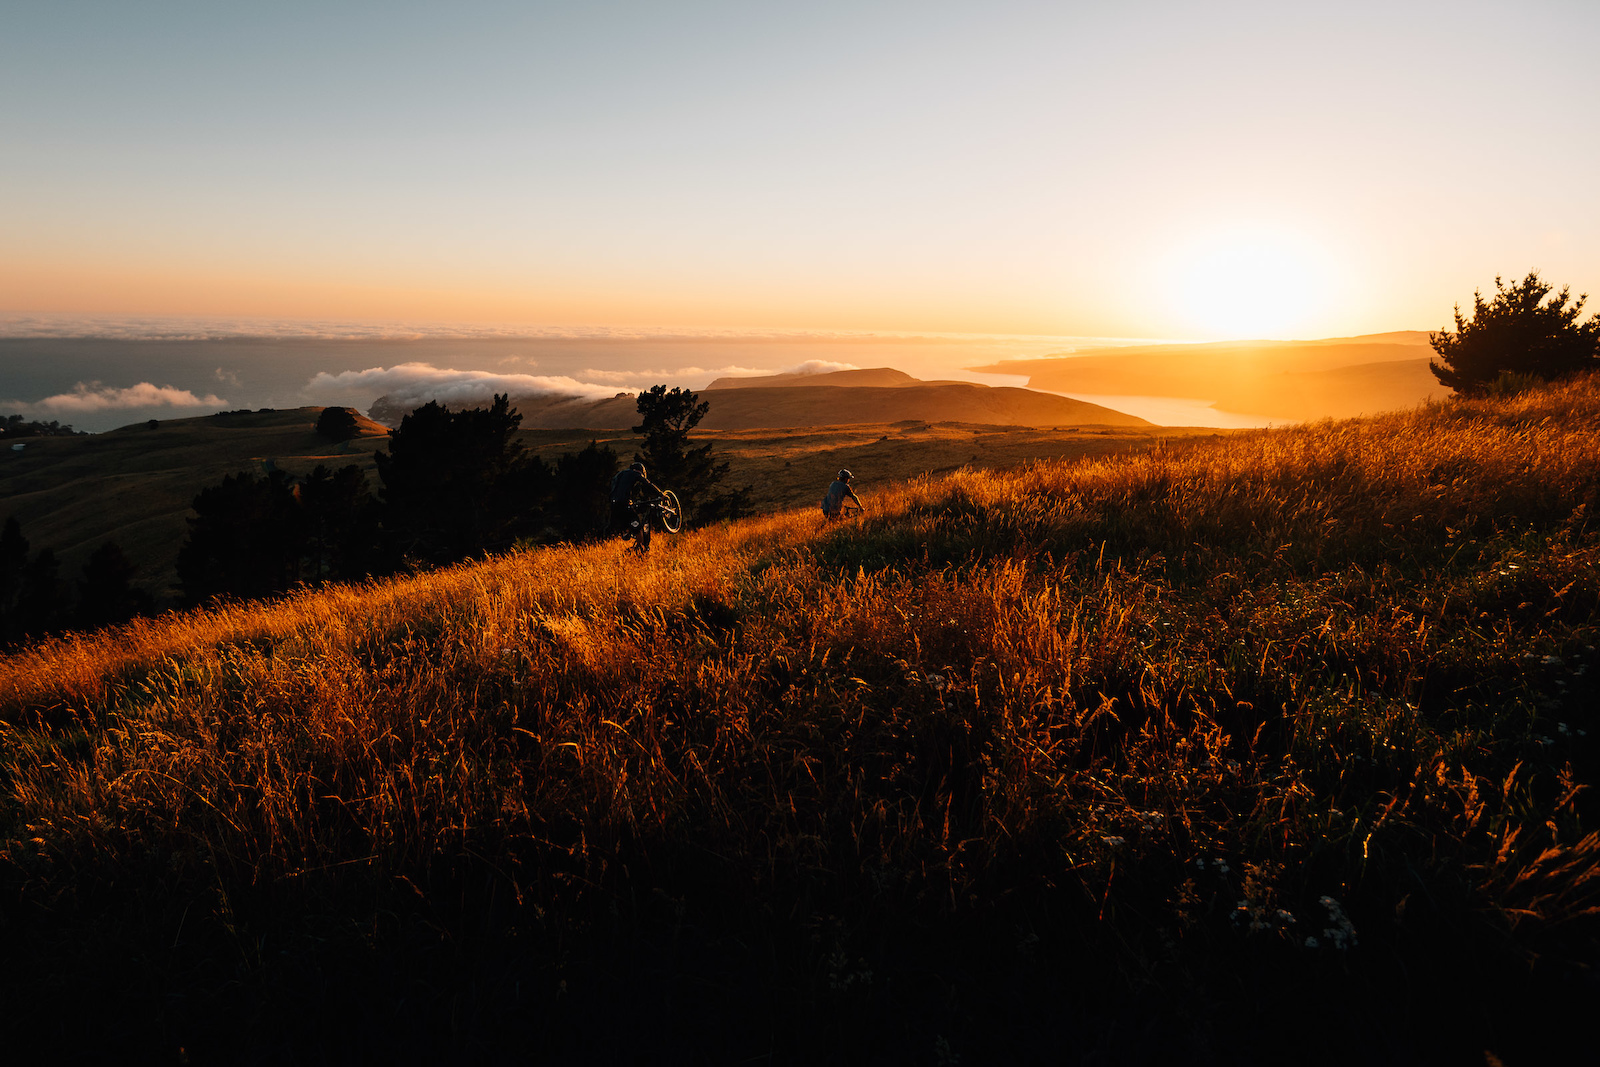 Riding into the rising sun towards Godley Head.